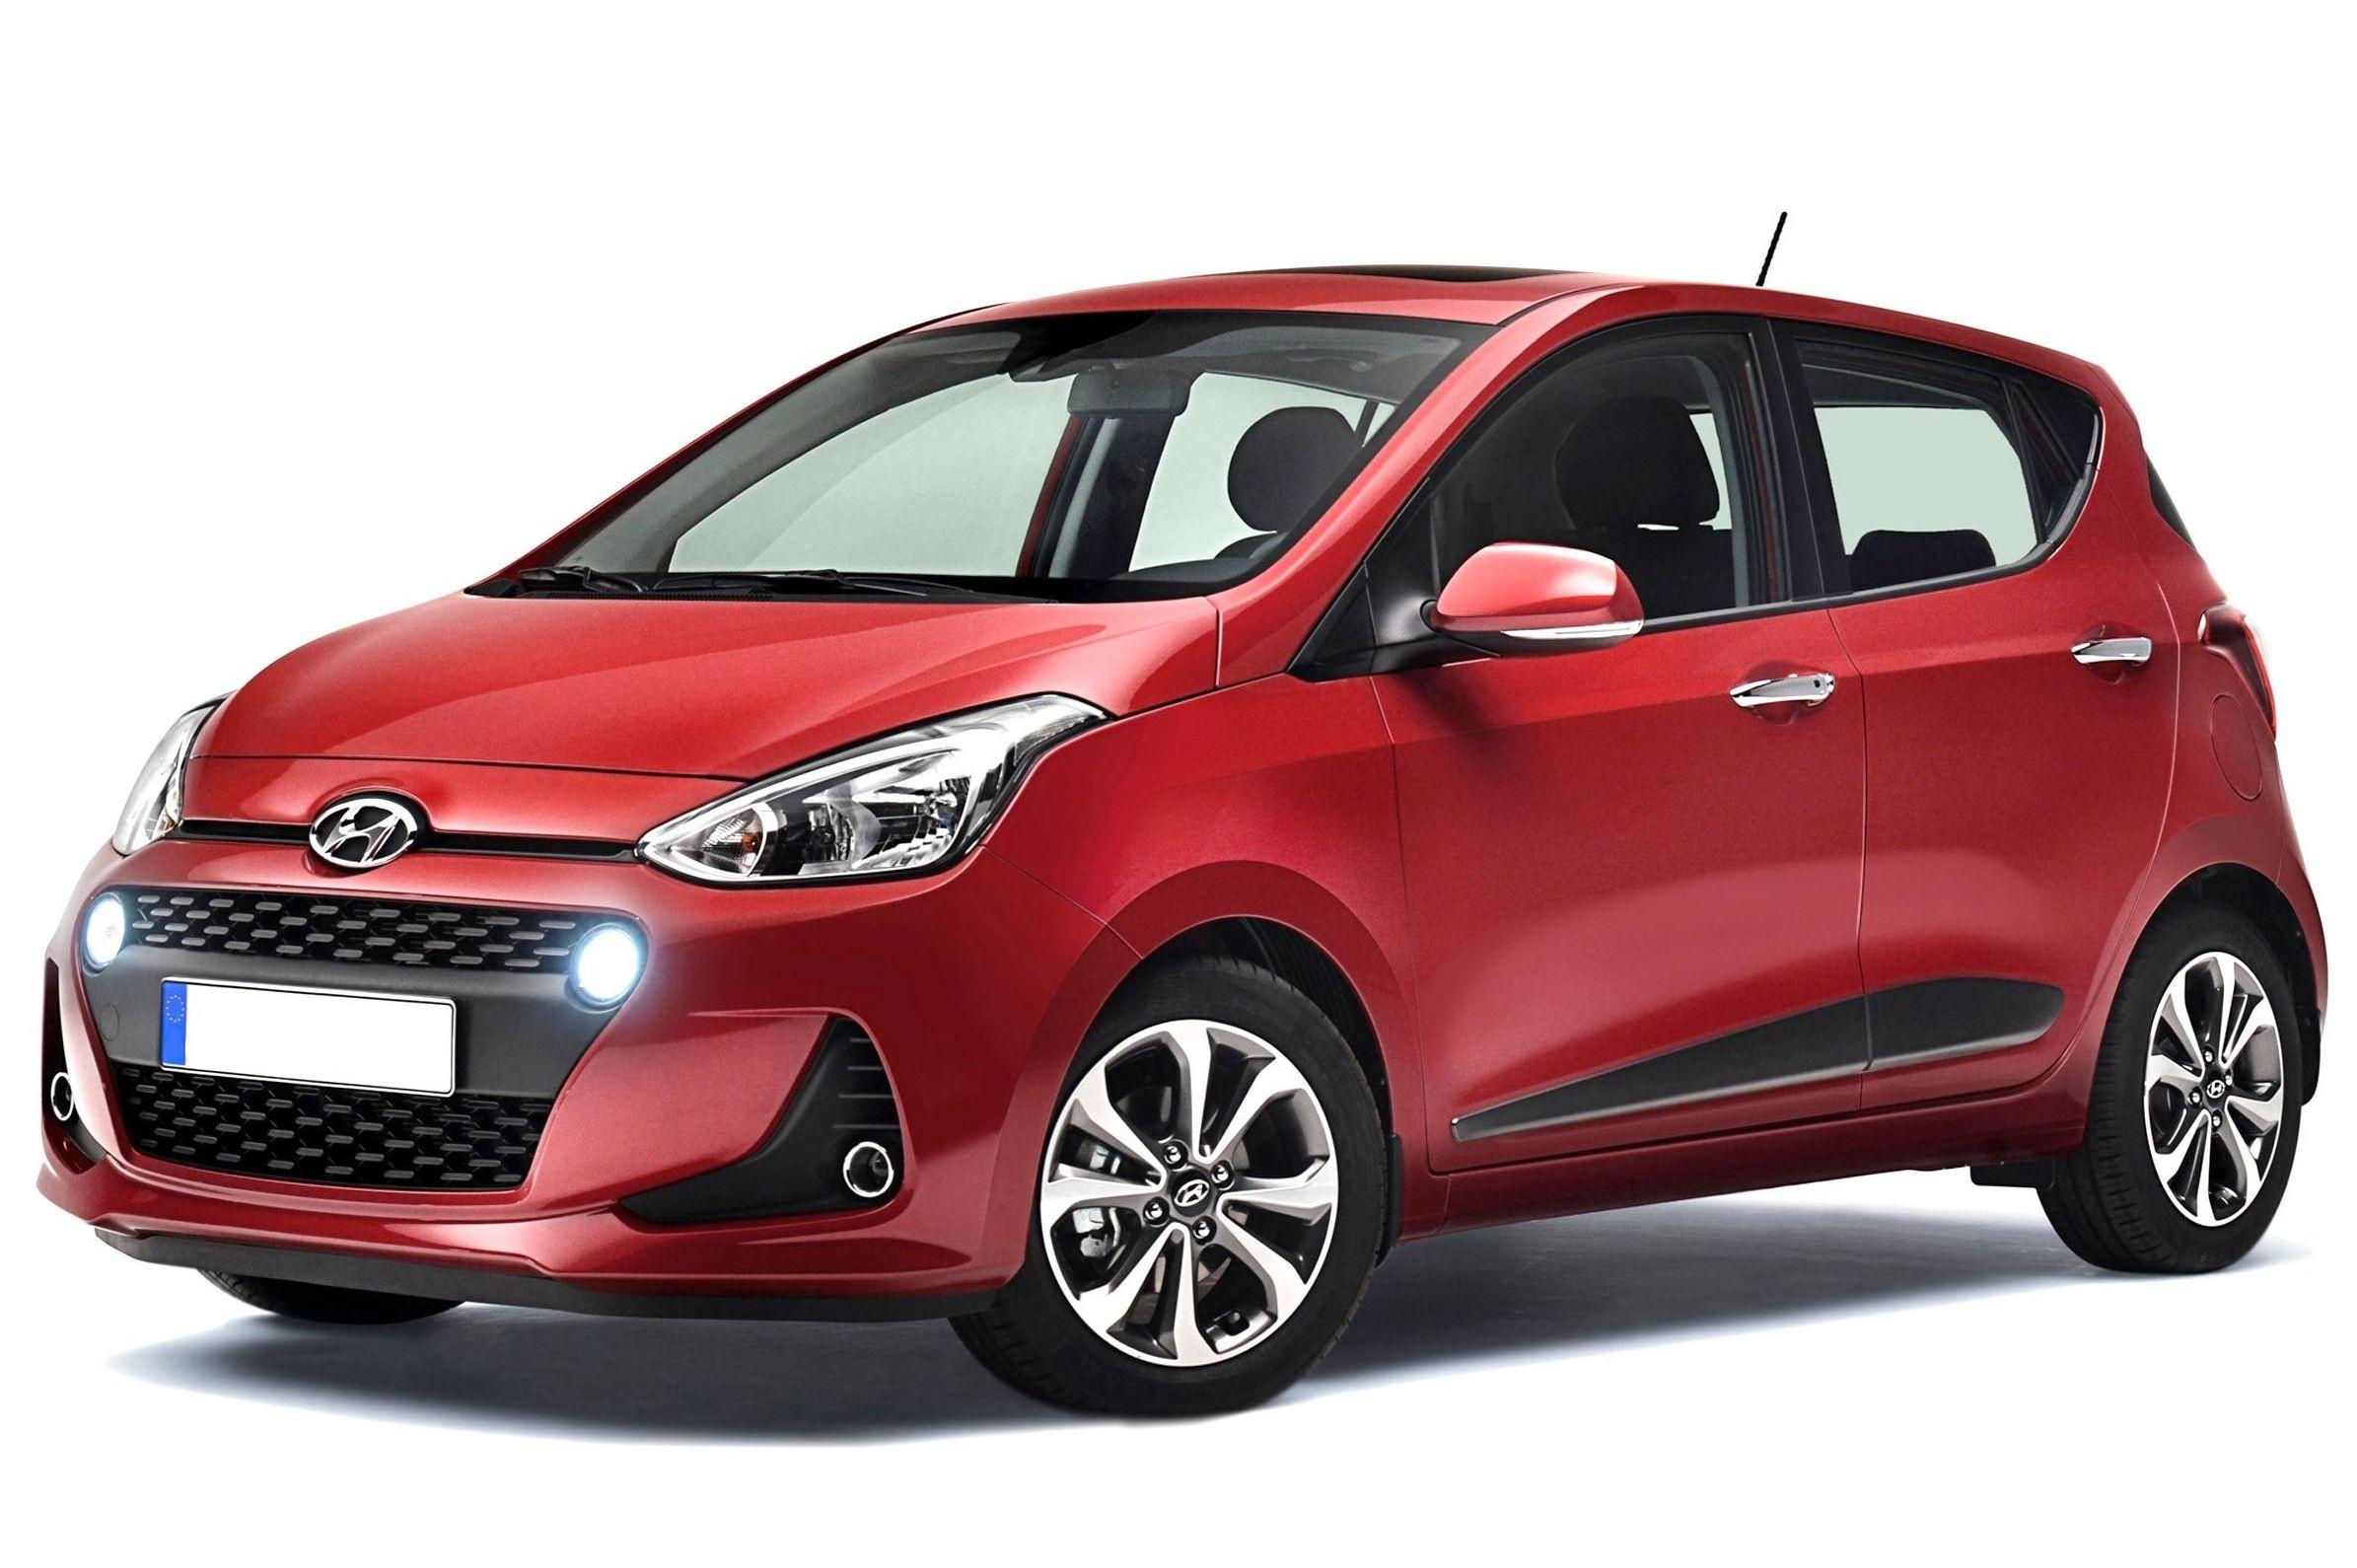 Coche Hyundai I10 gasolina: Flota de Fine Rent a Car